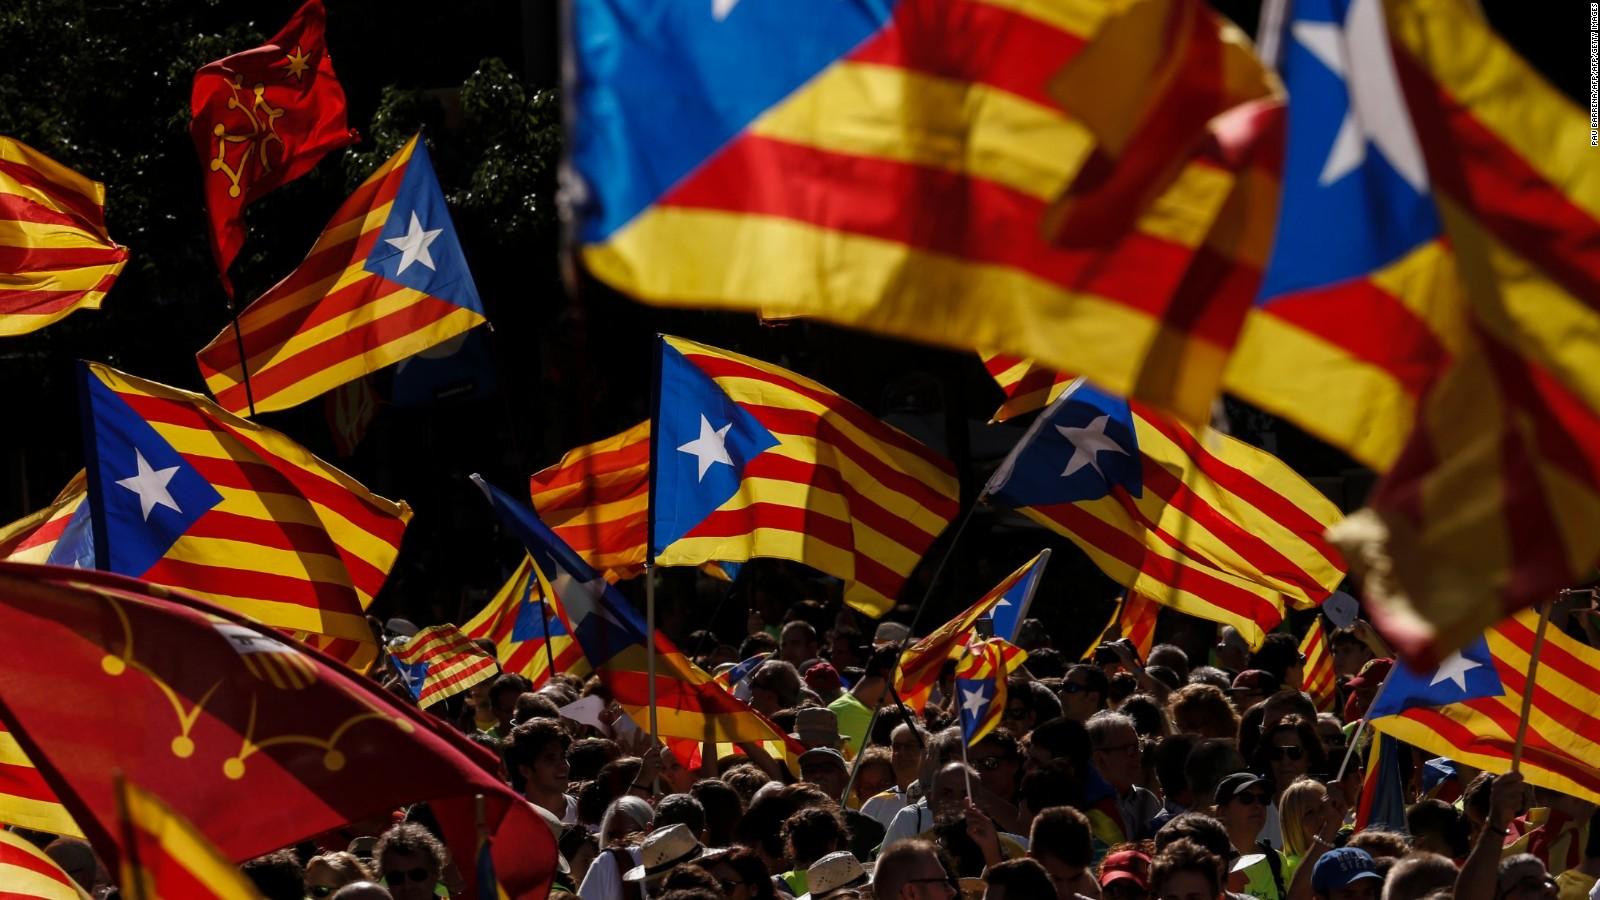 171005103015-catalonia-flags-full-169-TVCNews